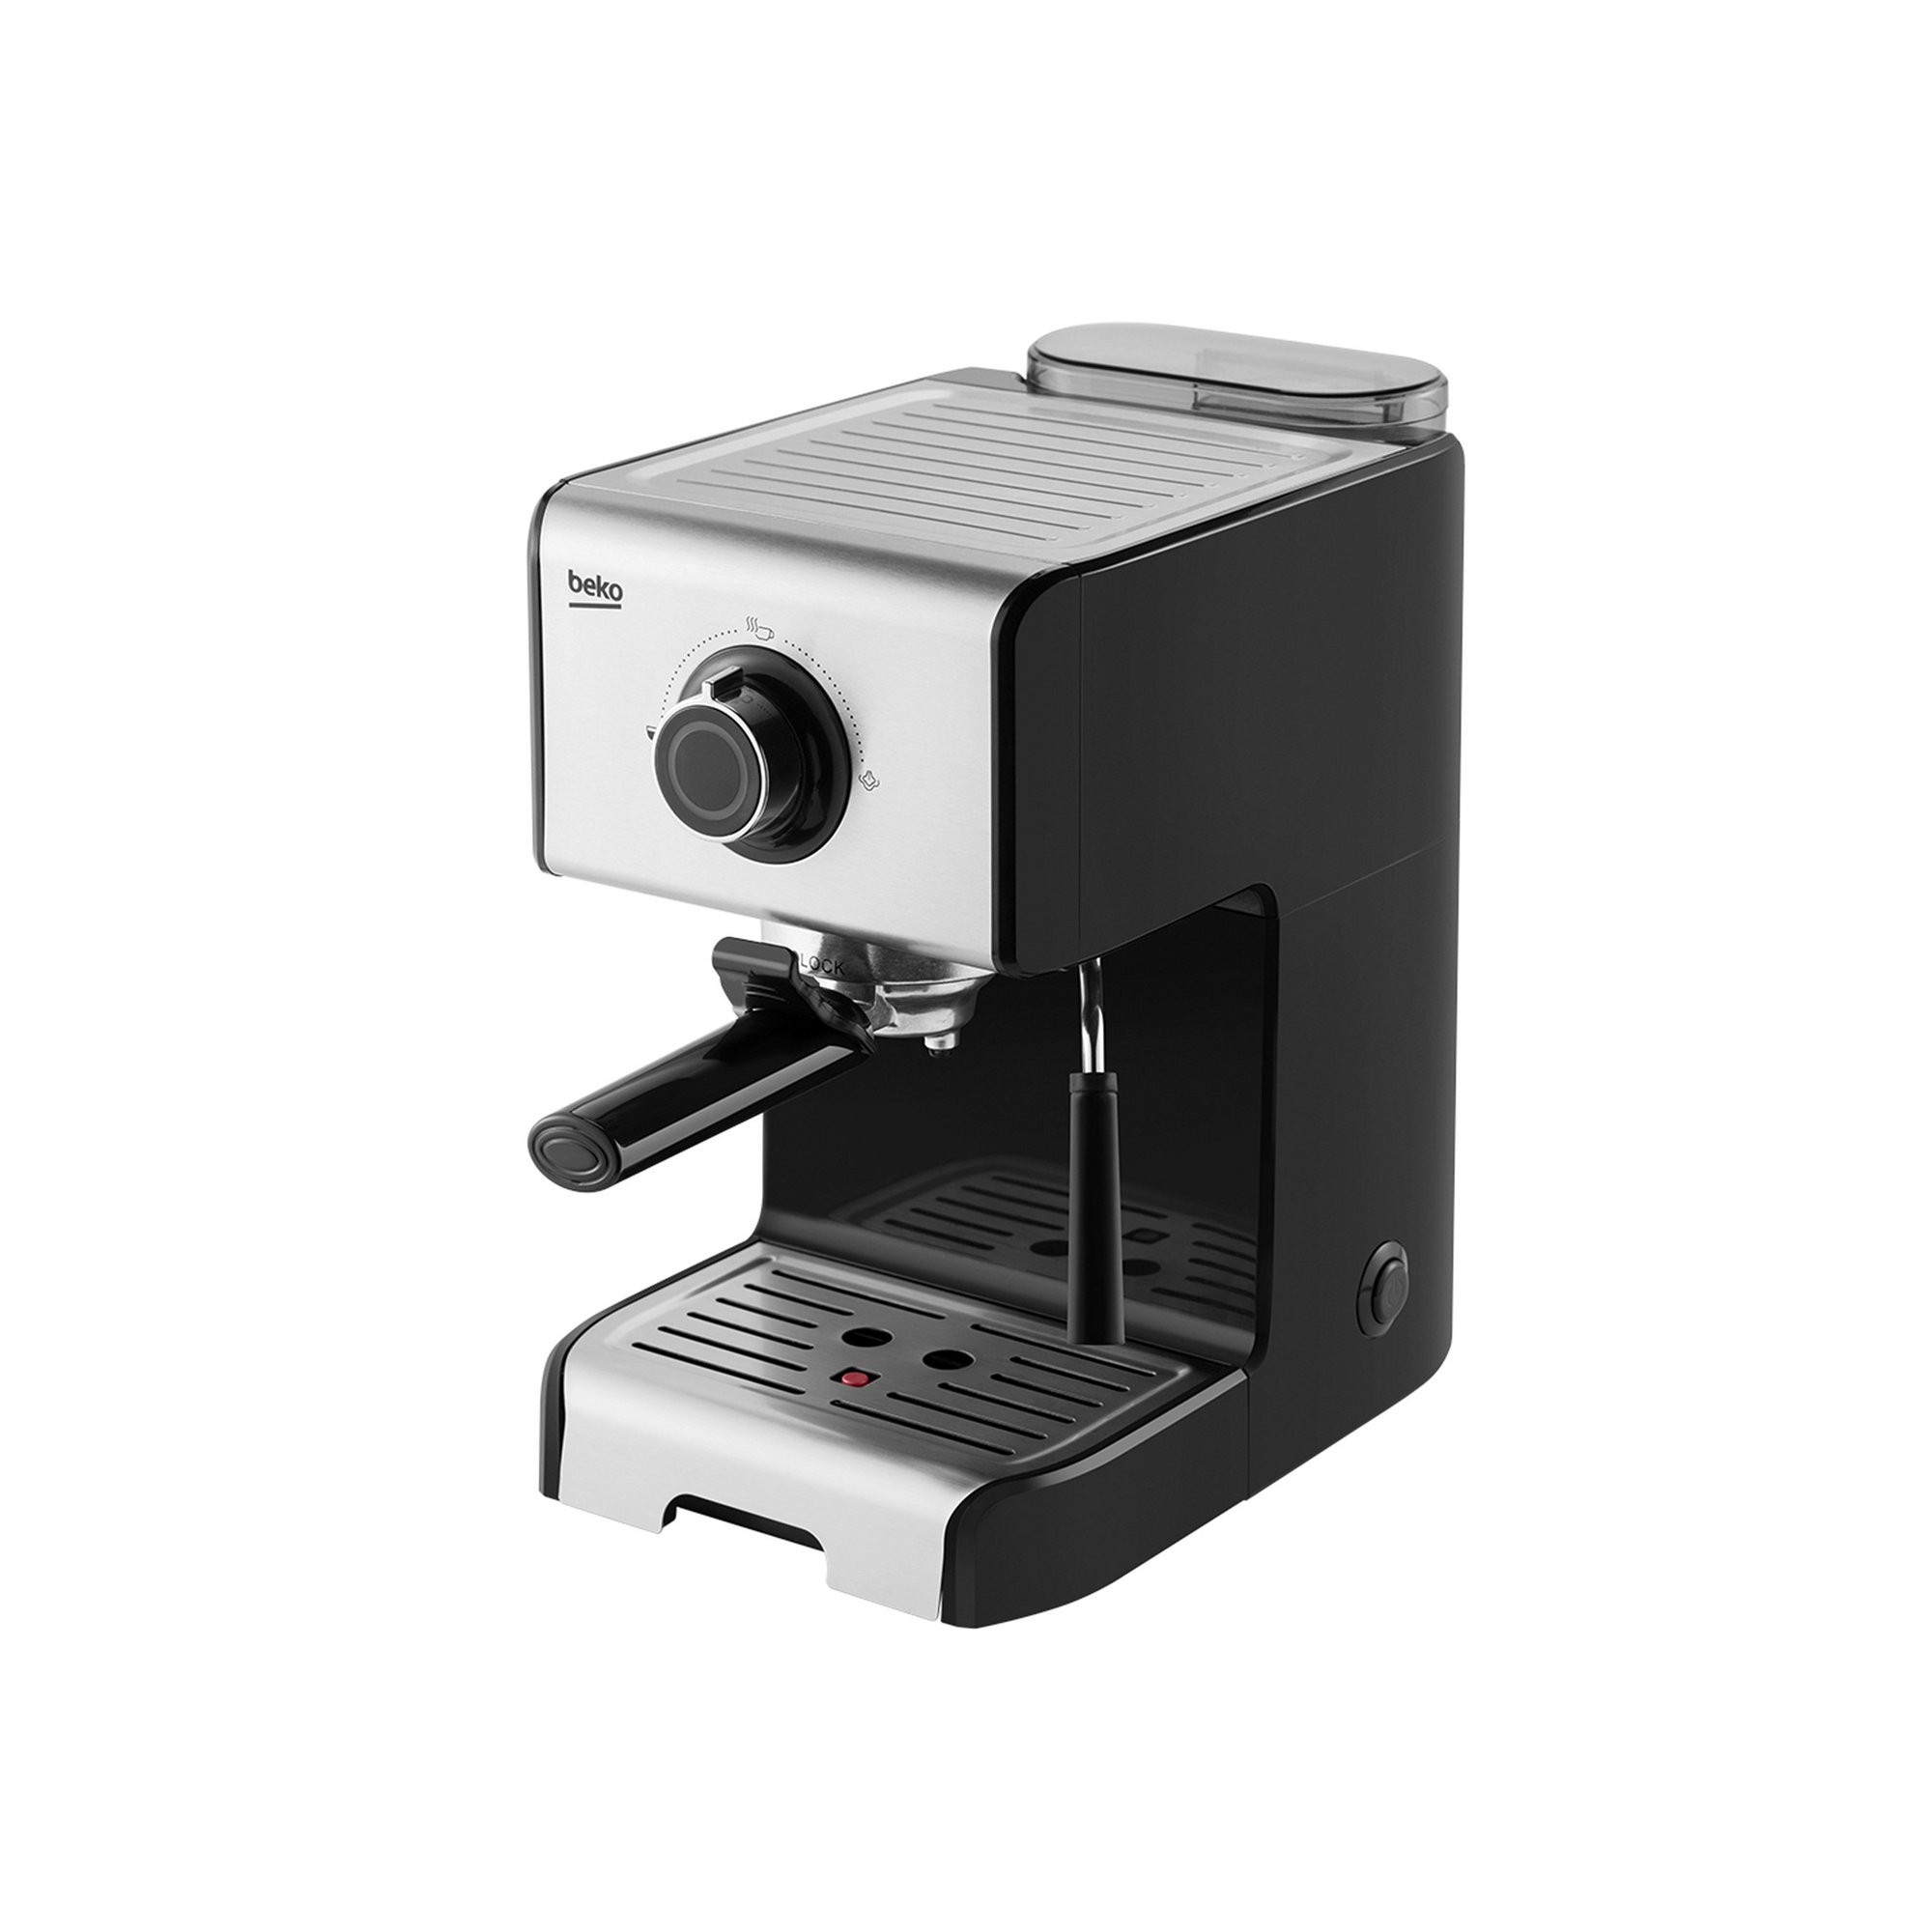 Image of Beko Espresso Coffee Machine